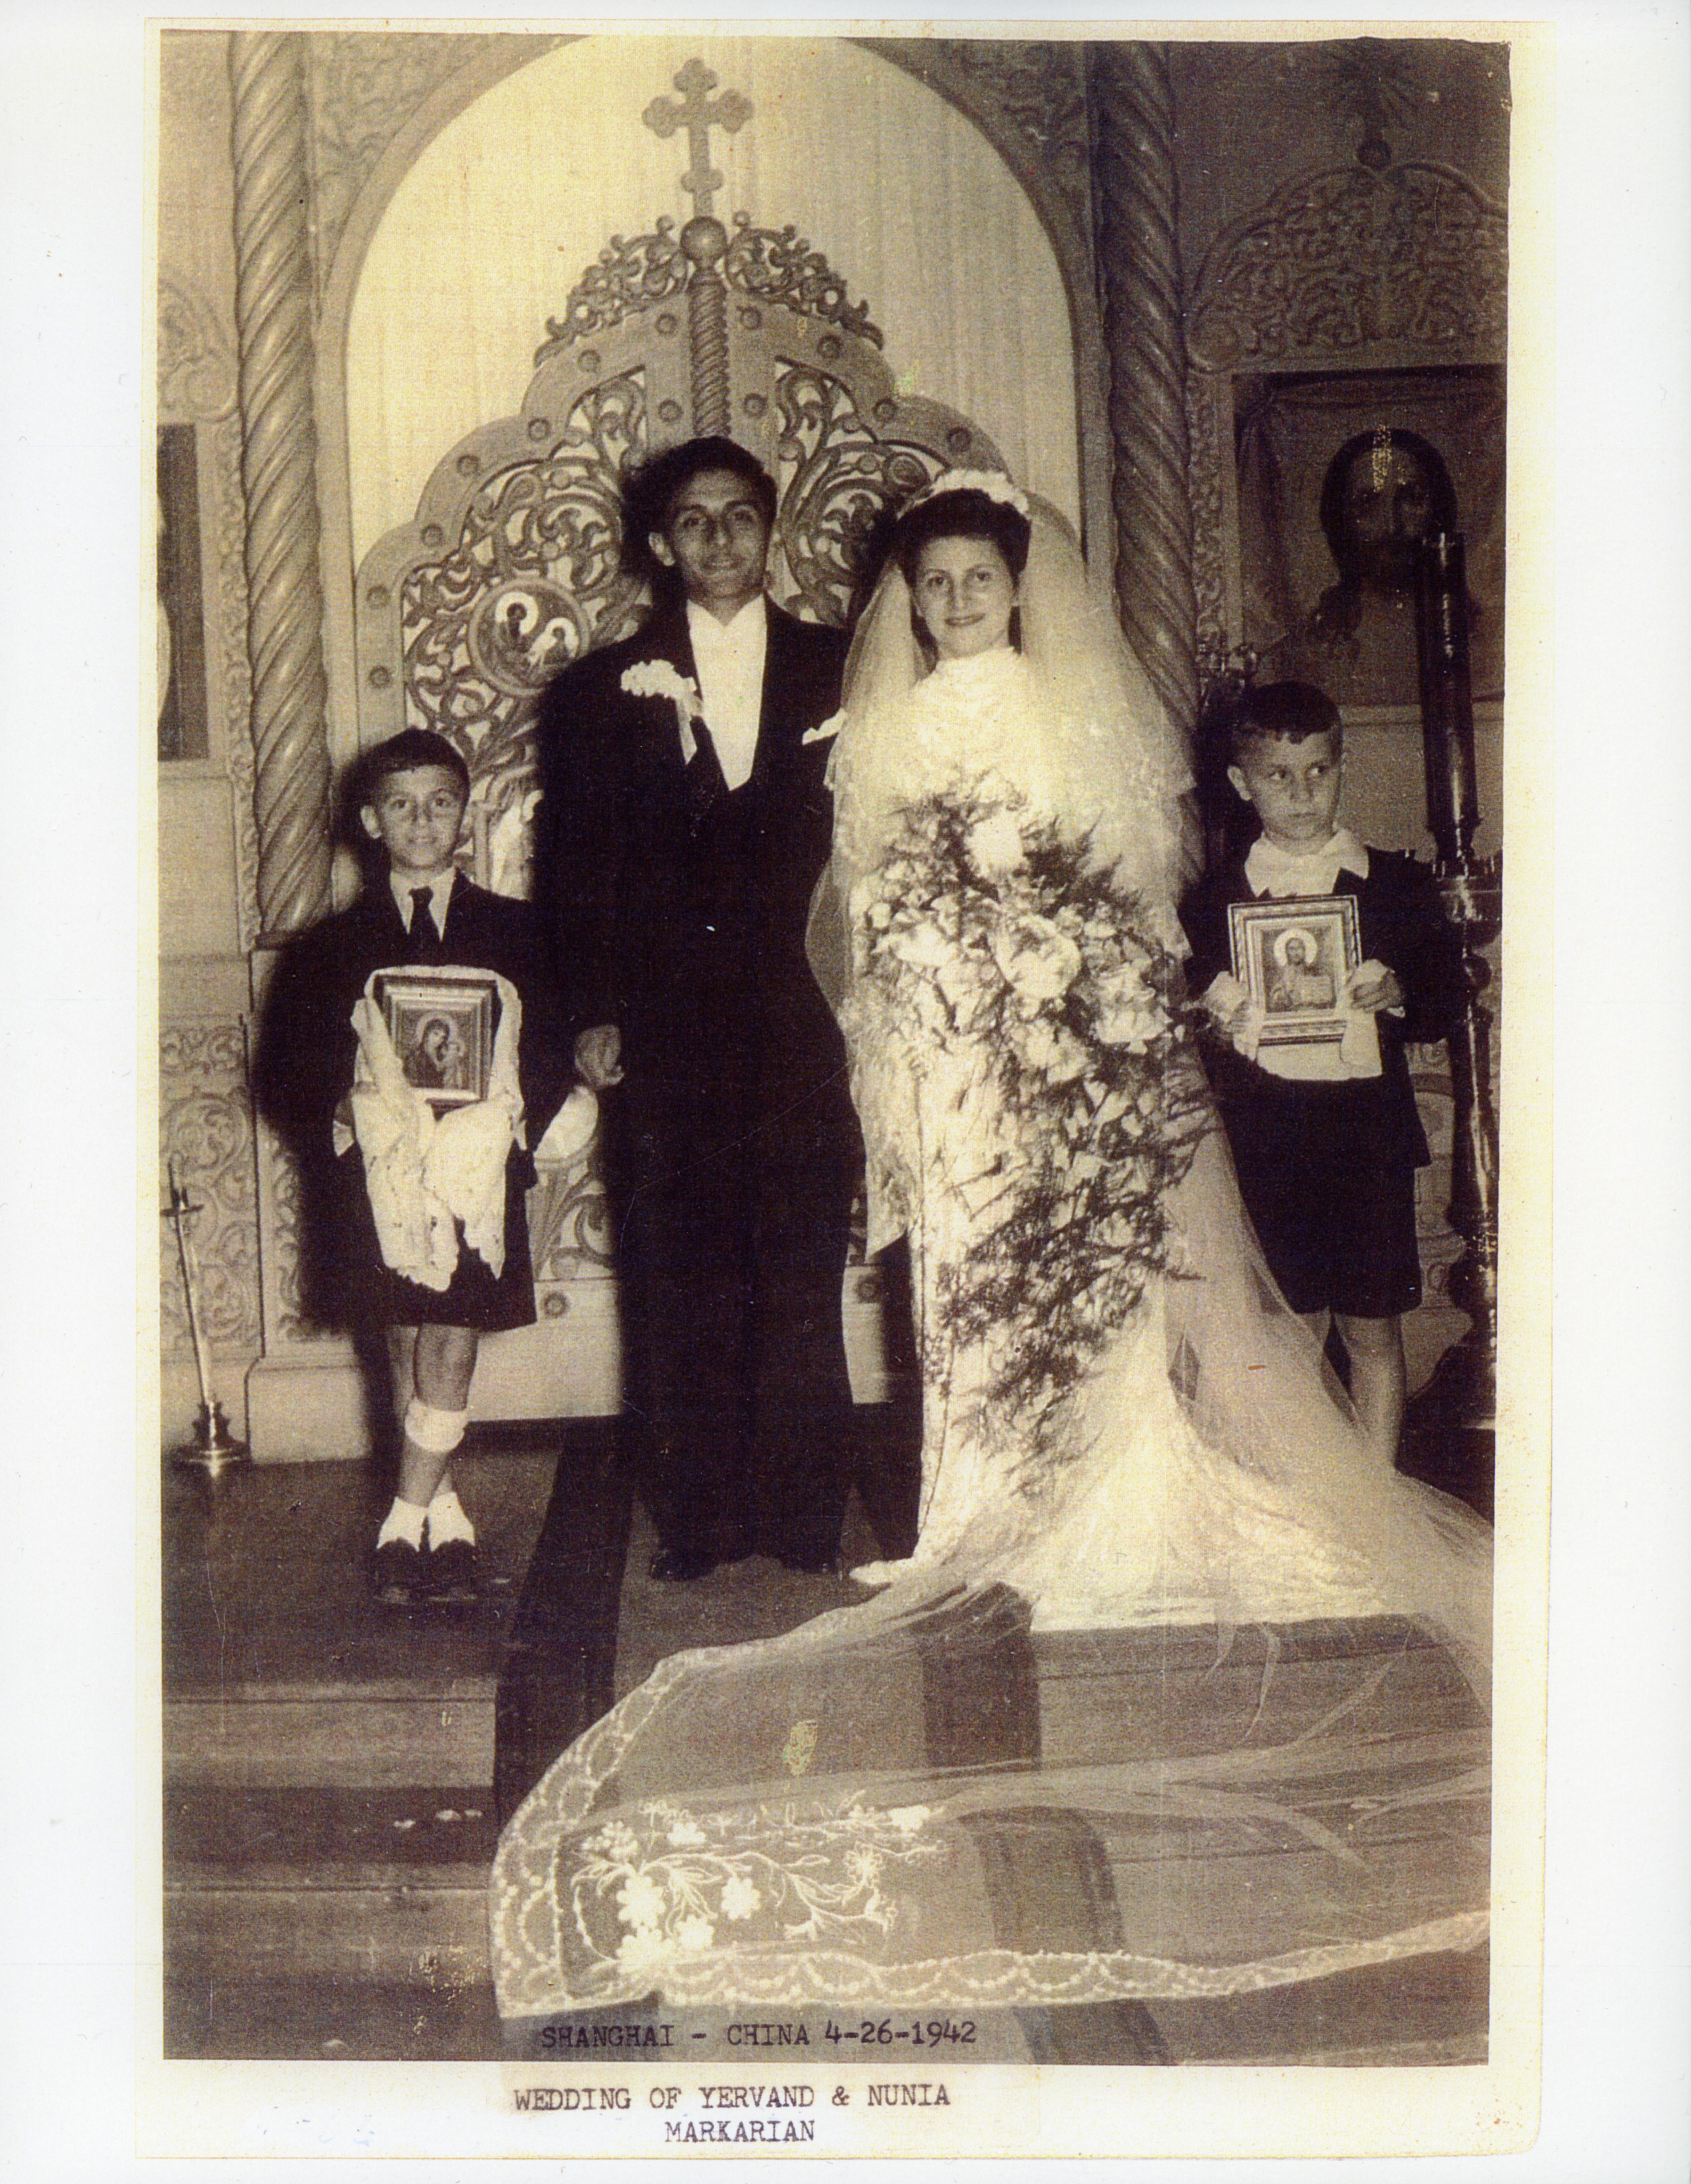 Armenian wedding, Shanghai, China, c. 1942